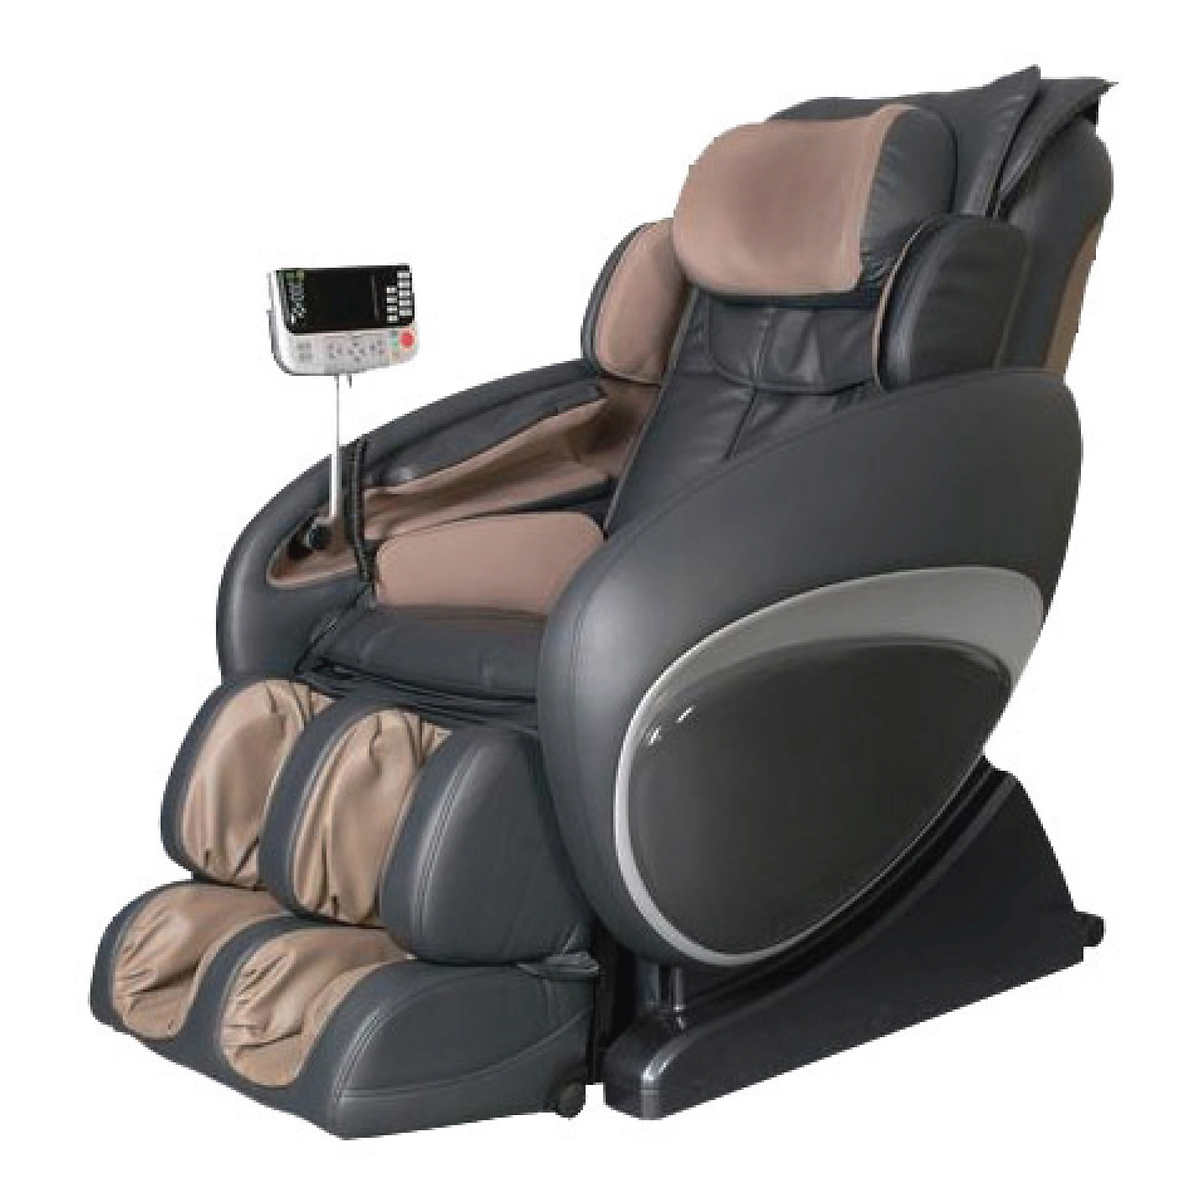 Osaki Massage Chair OS 4000Massage Chairs   Costco. Infinity Massage Chairs Canada. Home Design Ideas